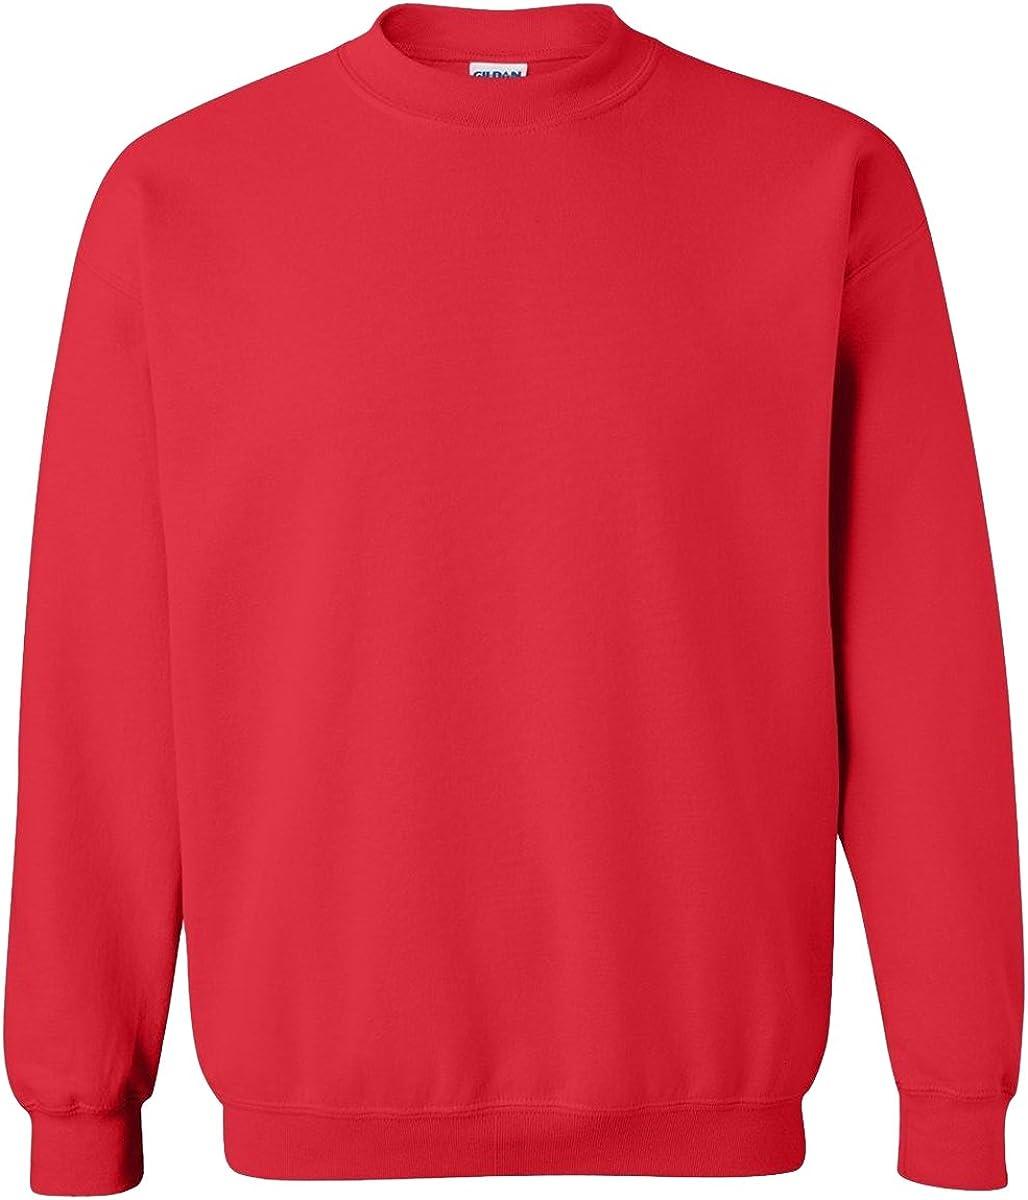 Gildan Activewear 50/50 Crewneck Sweatshirt, XL, Red